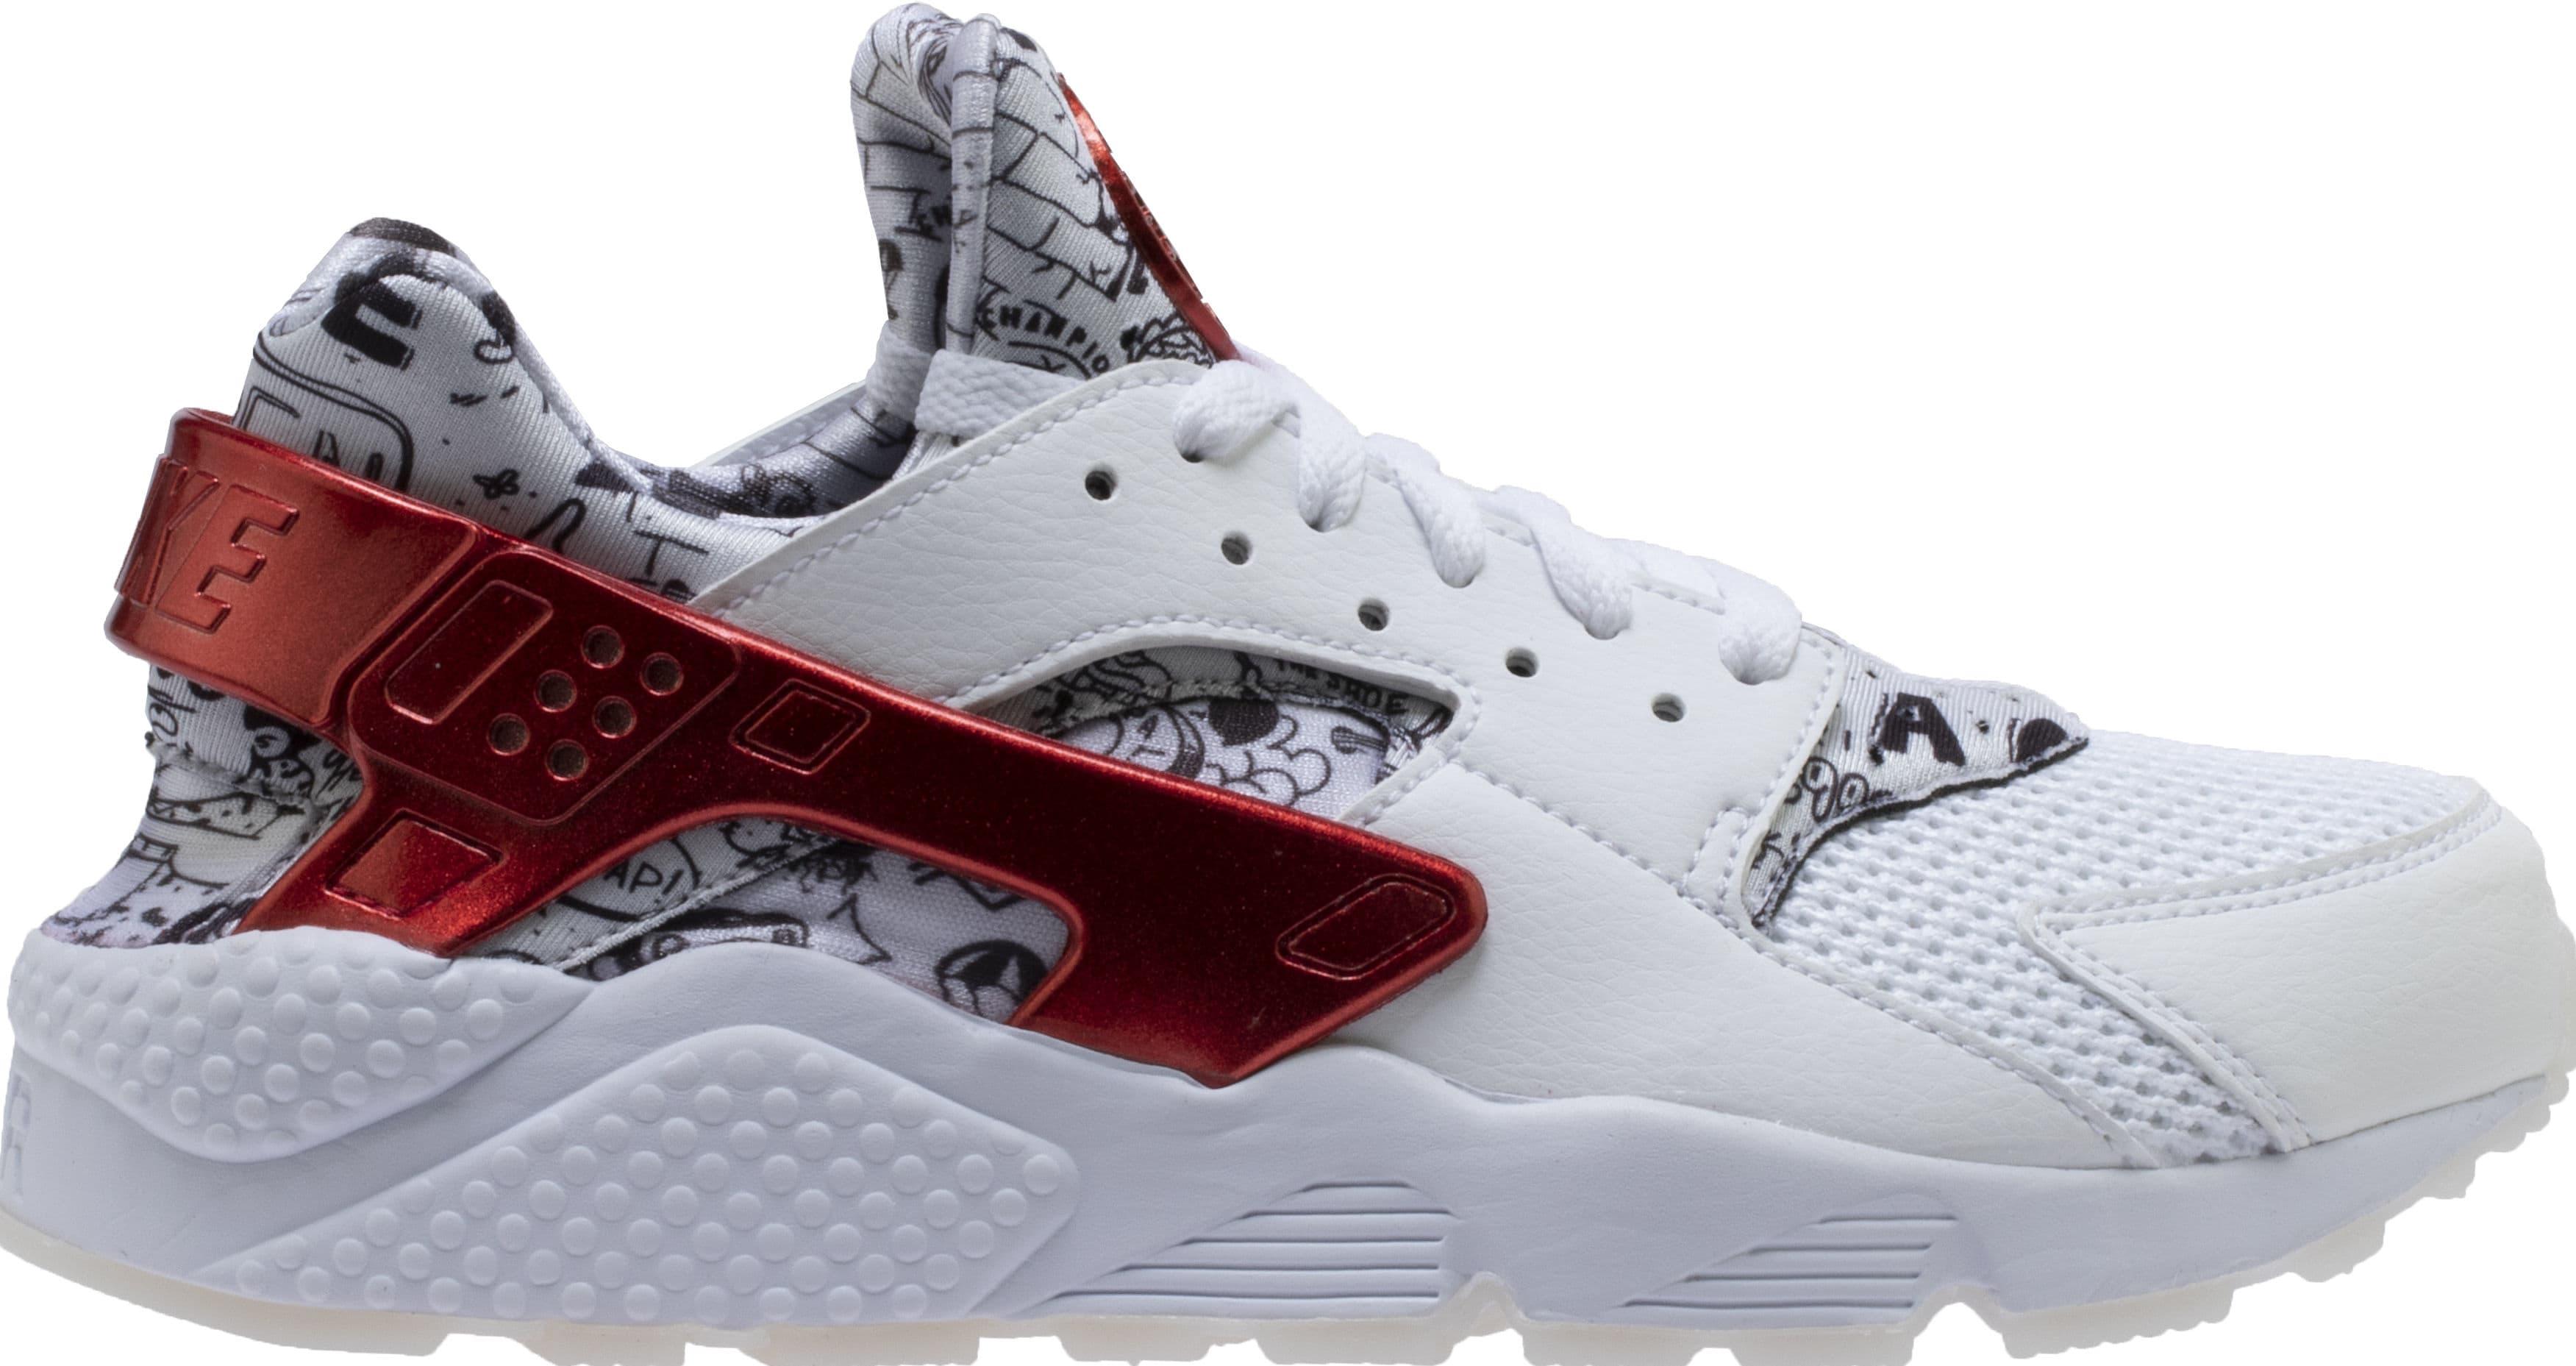 Nike Air Huarache. Follow this Model. Image via Shoe Palace